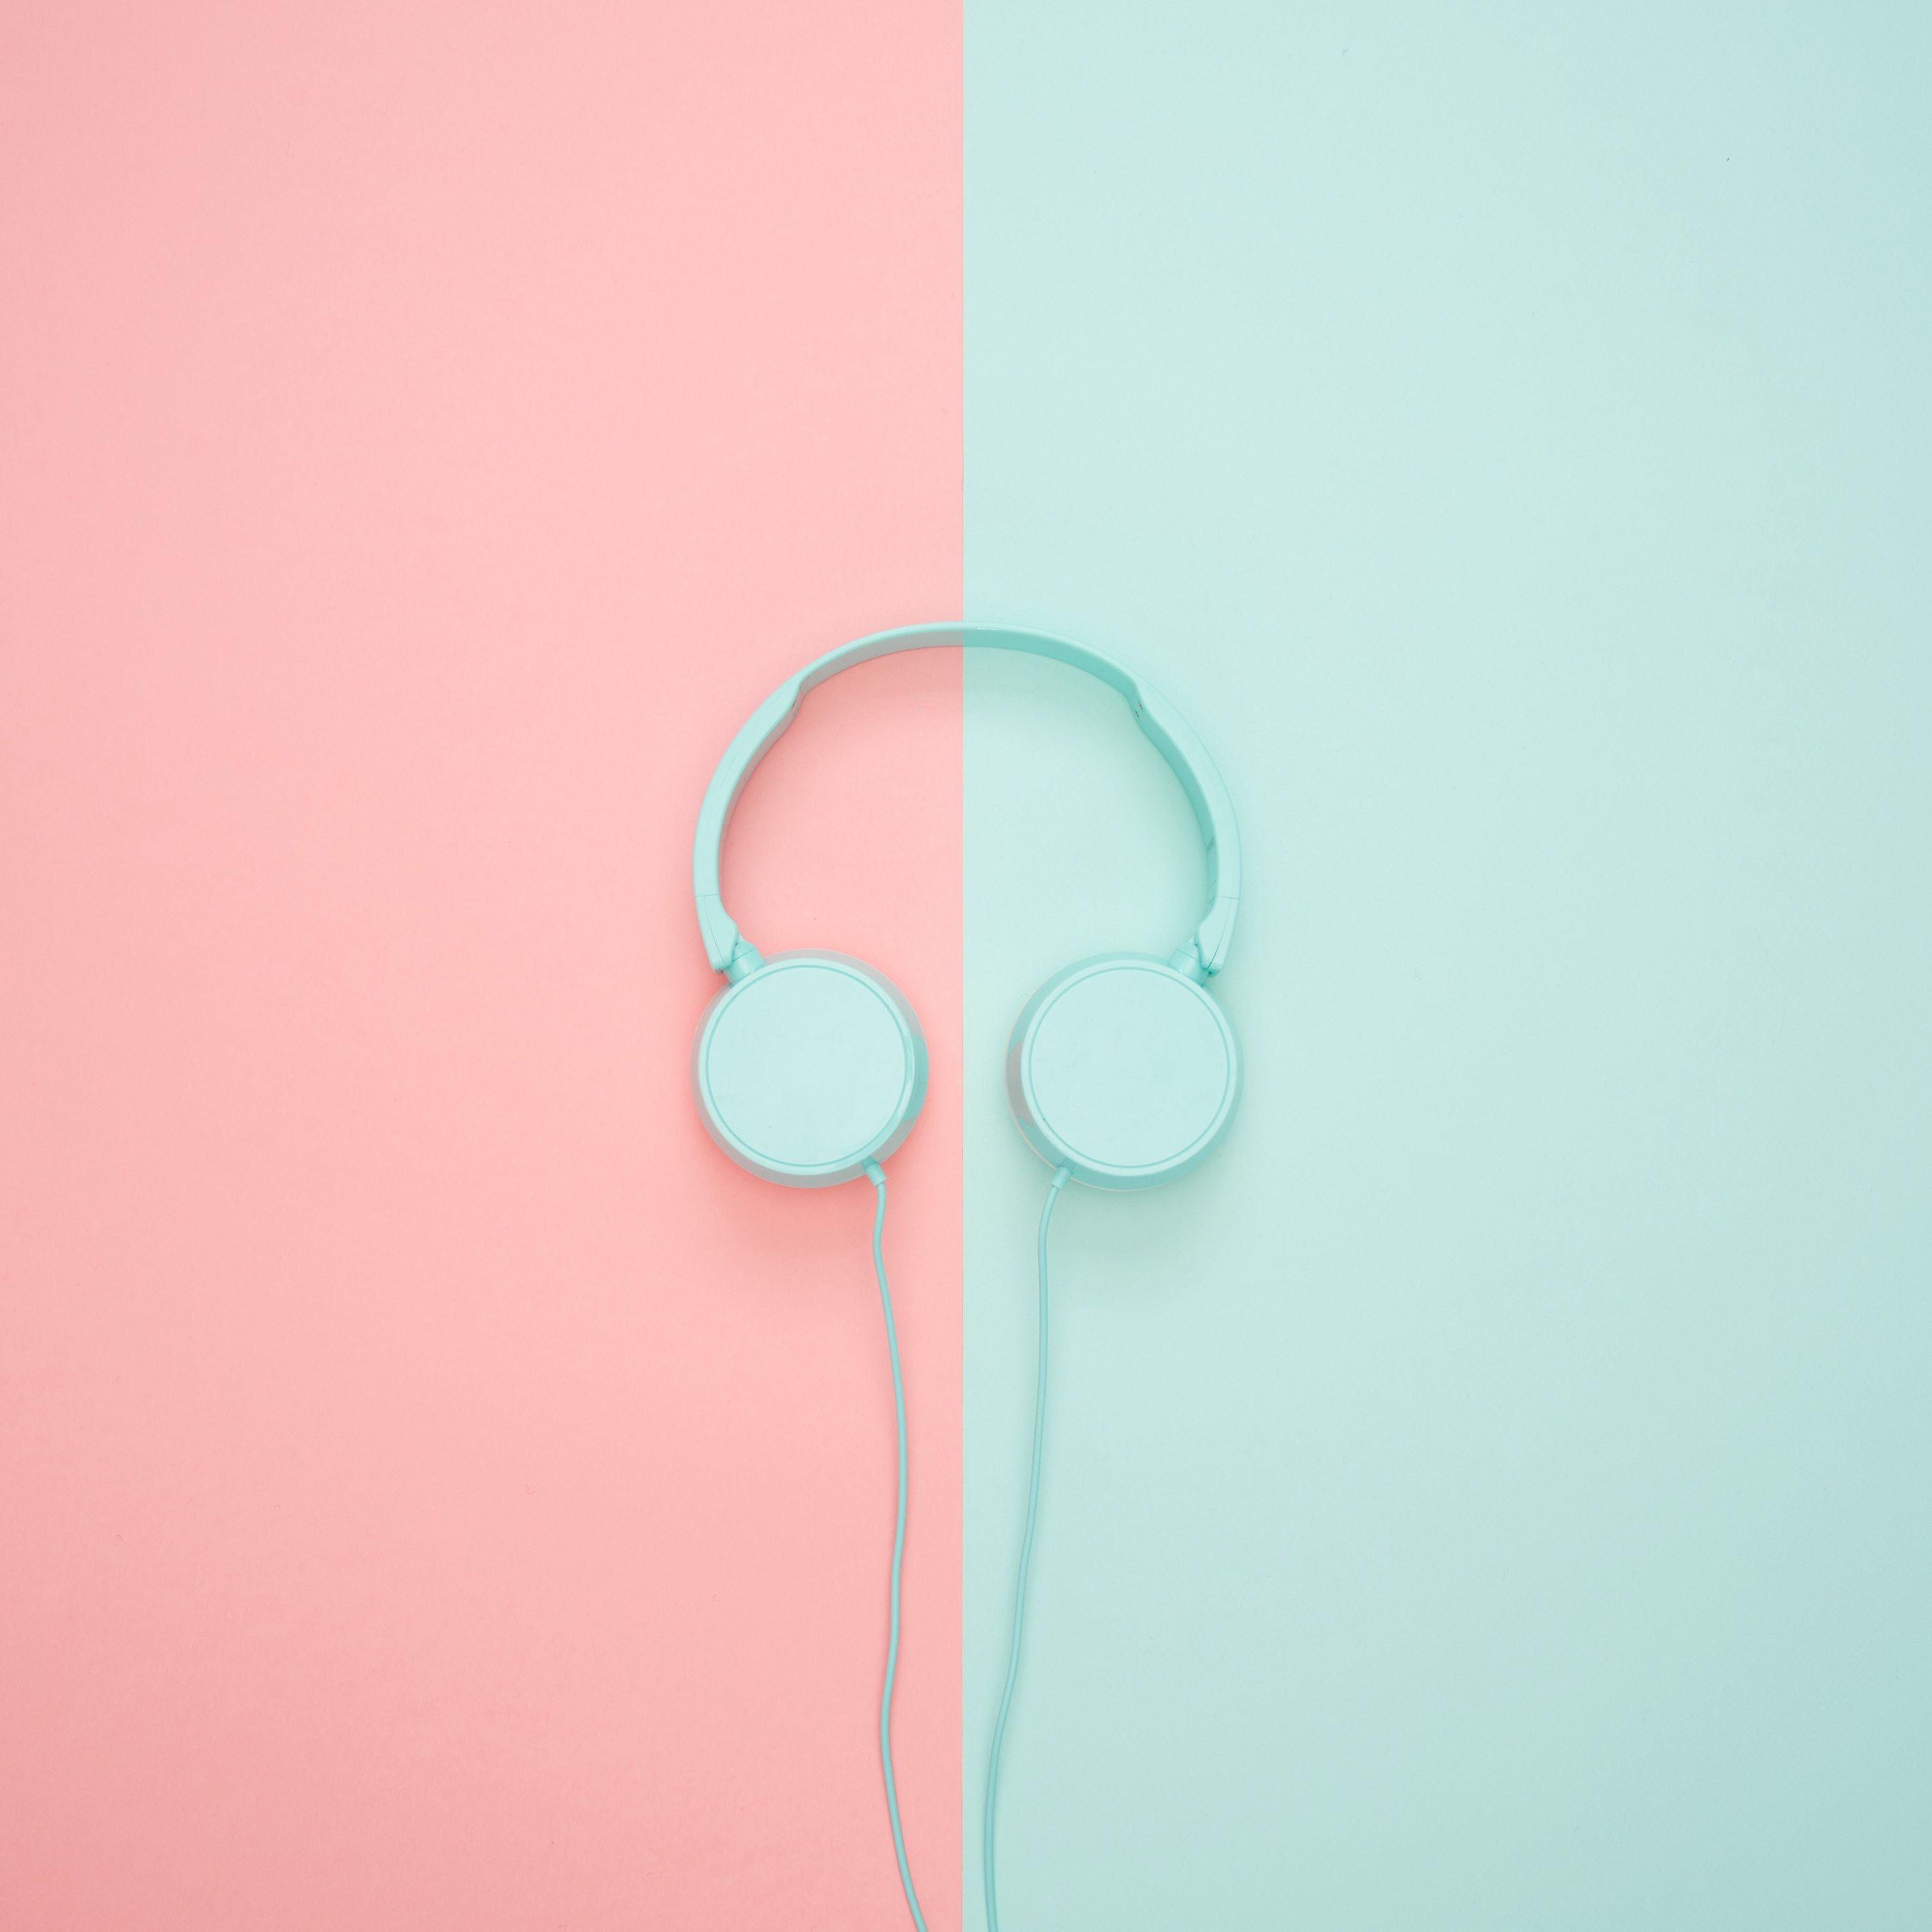 2780x2780 Wallpaper headphones, minimalism, pastel, pink